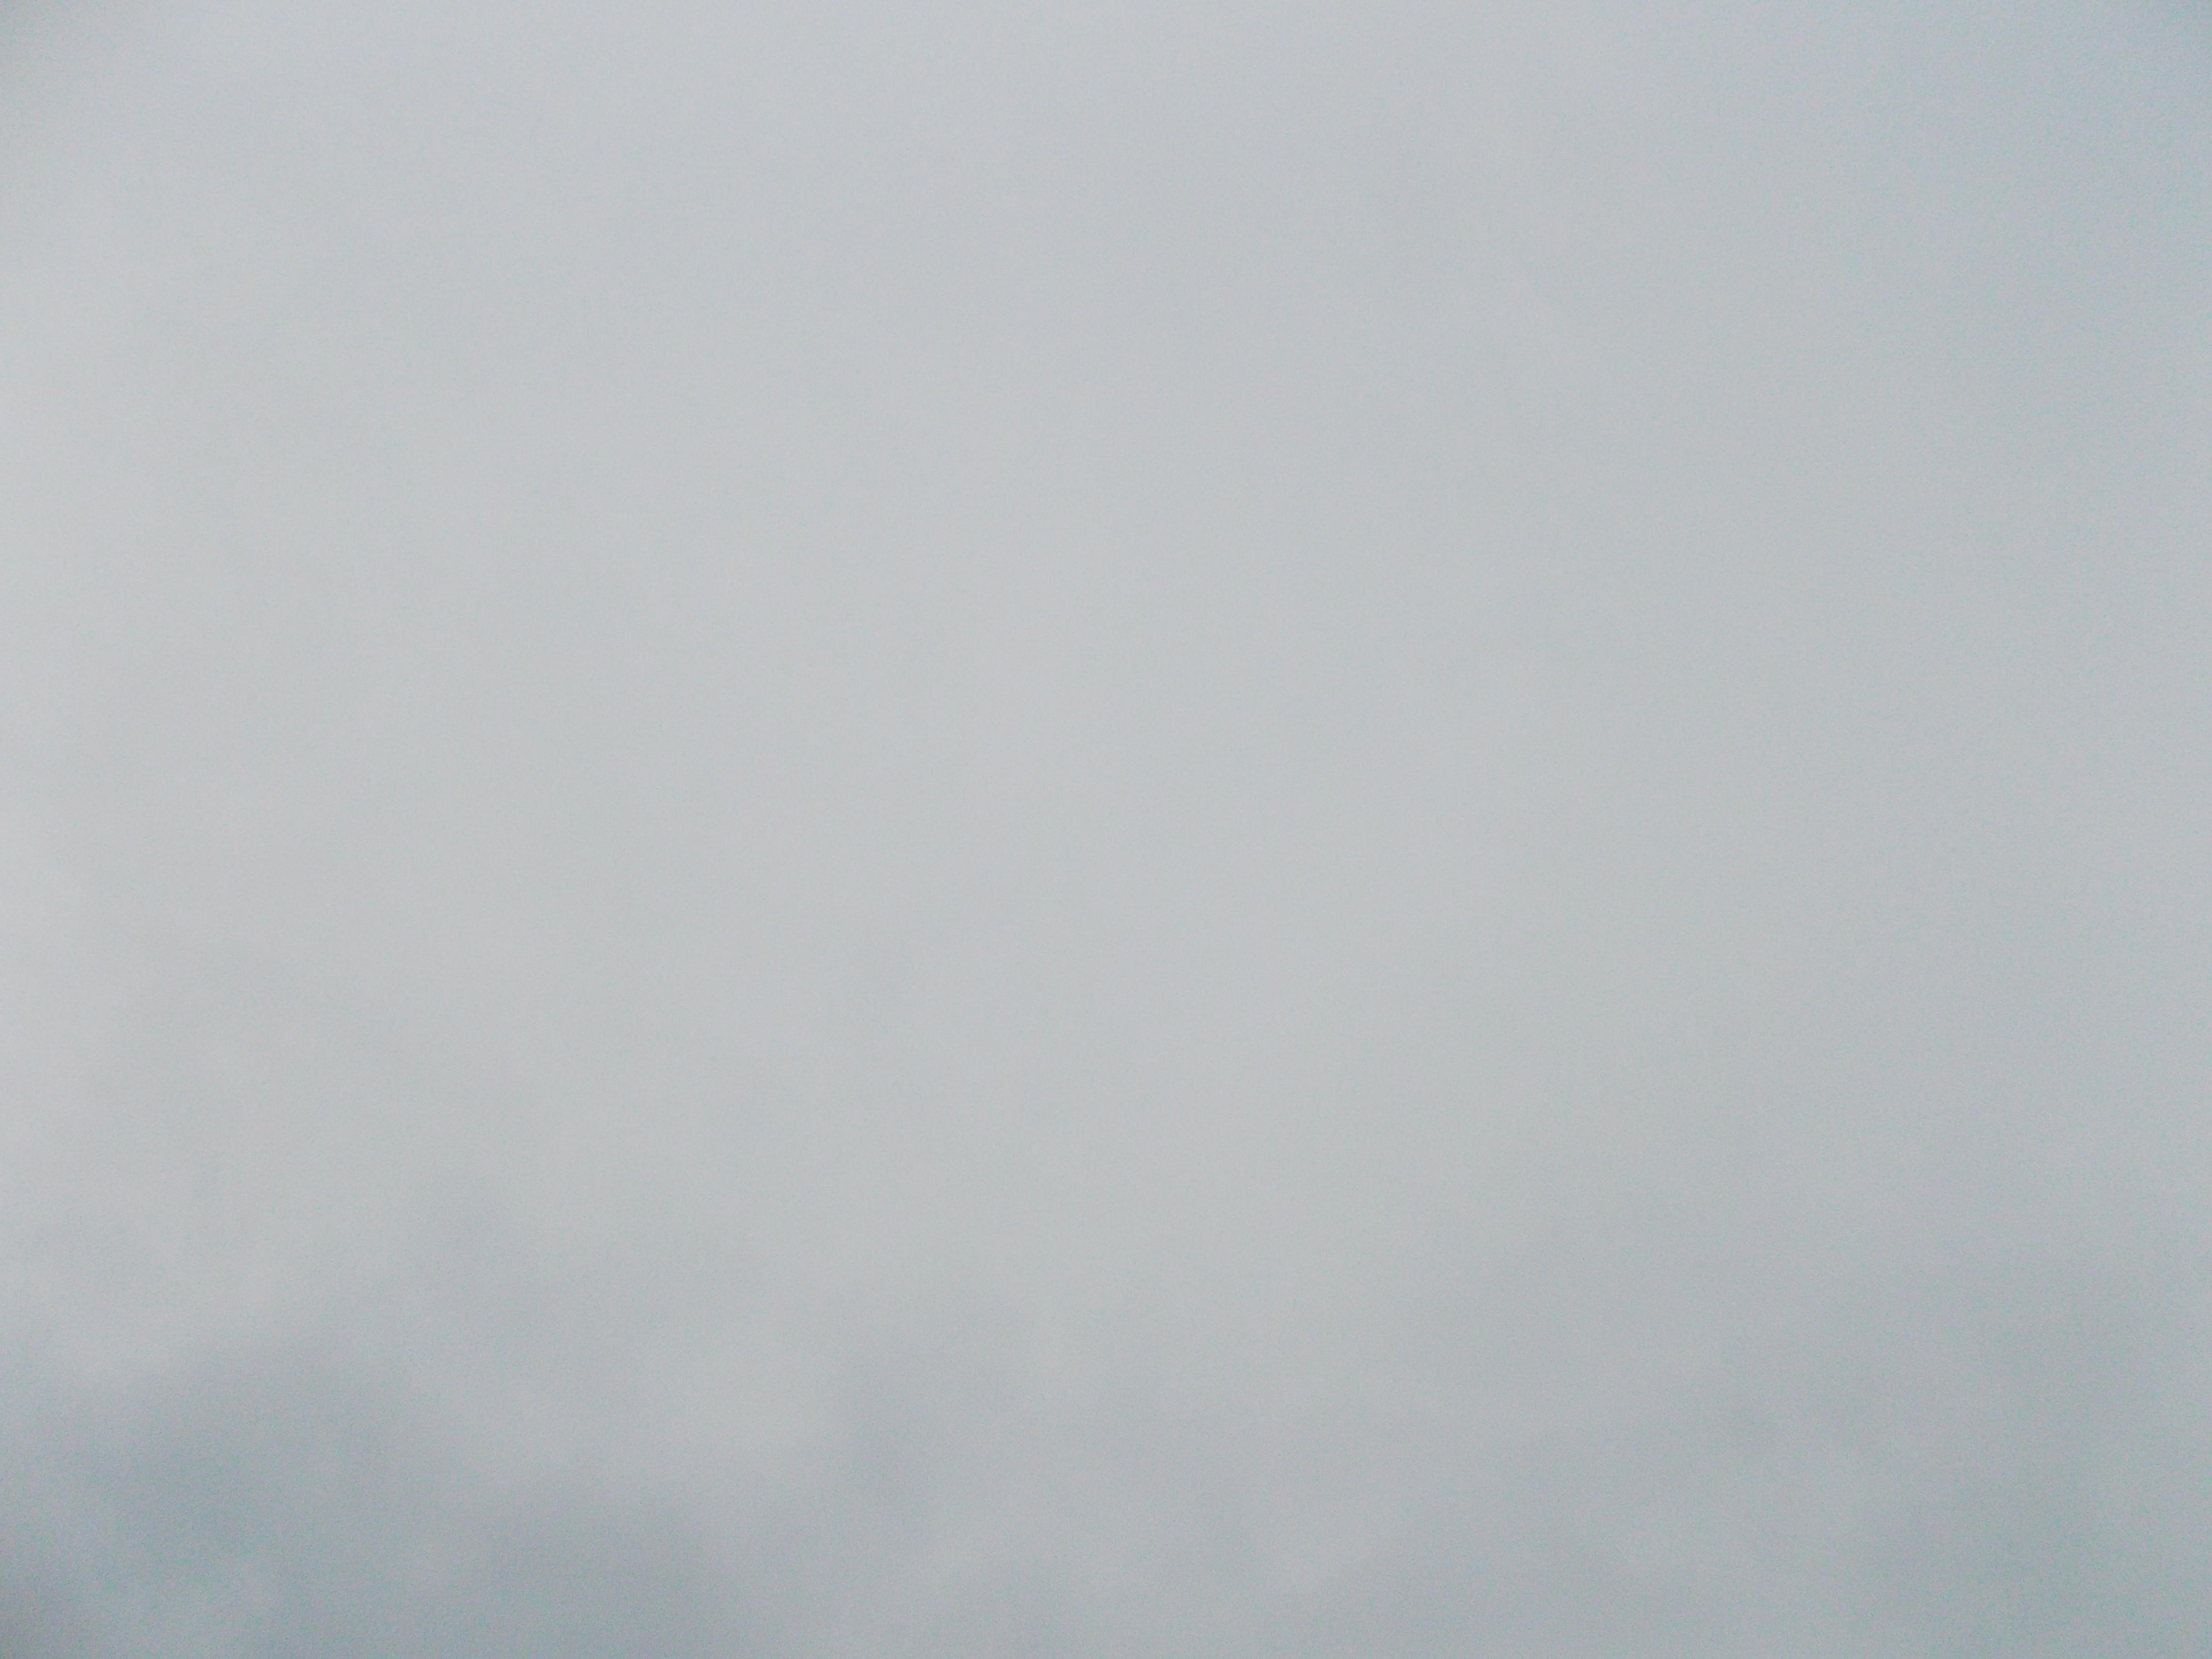 2013-02-13 Longitude -0.371 Latitude 49.182 Altitude 13 Heure 13h18